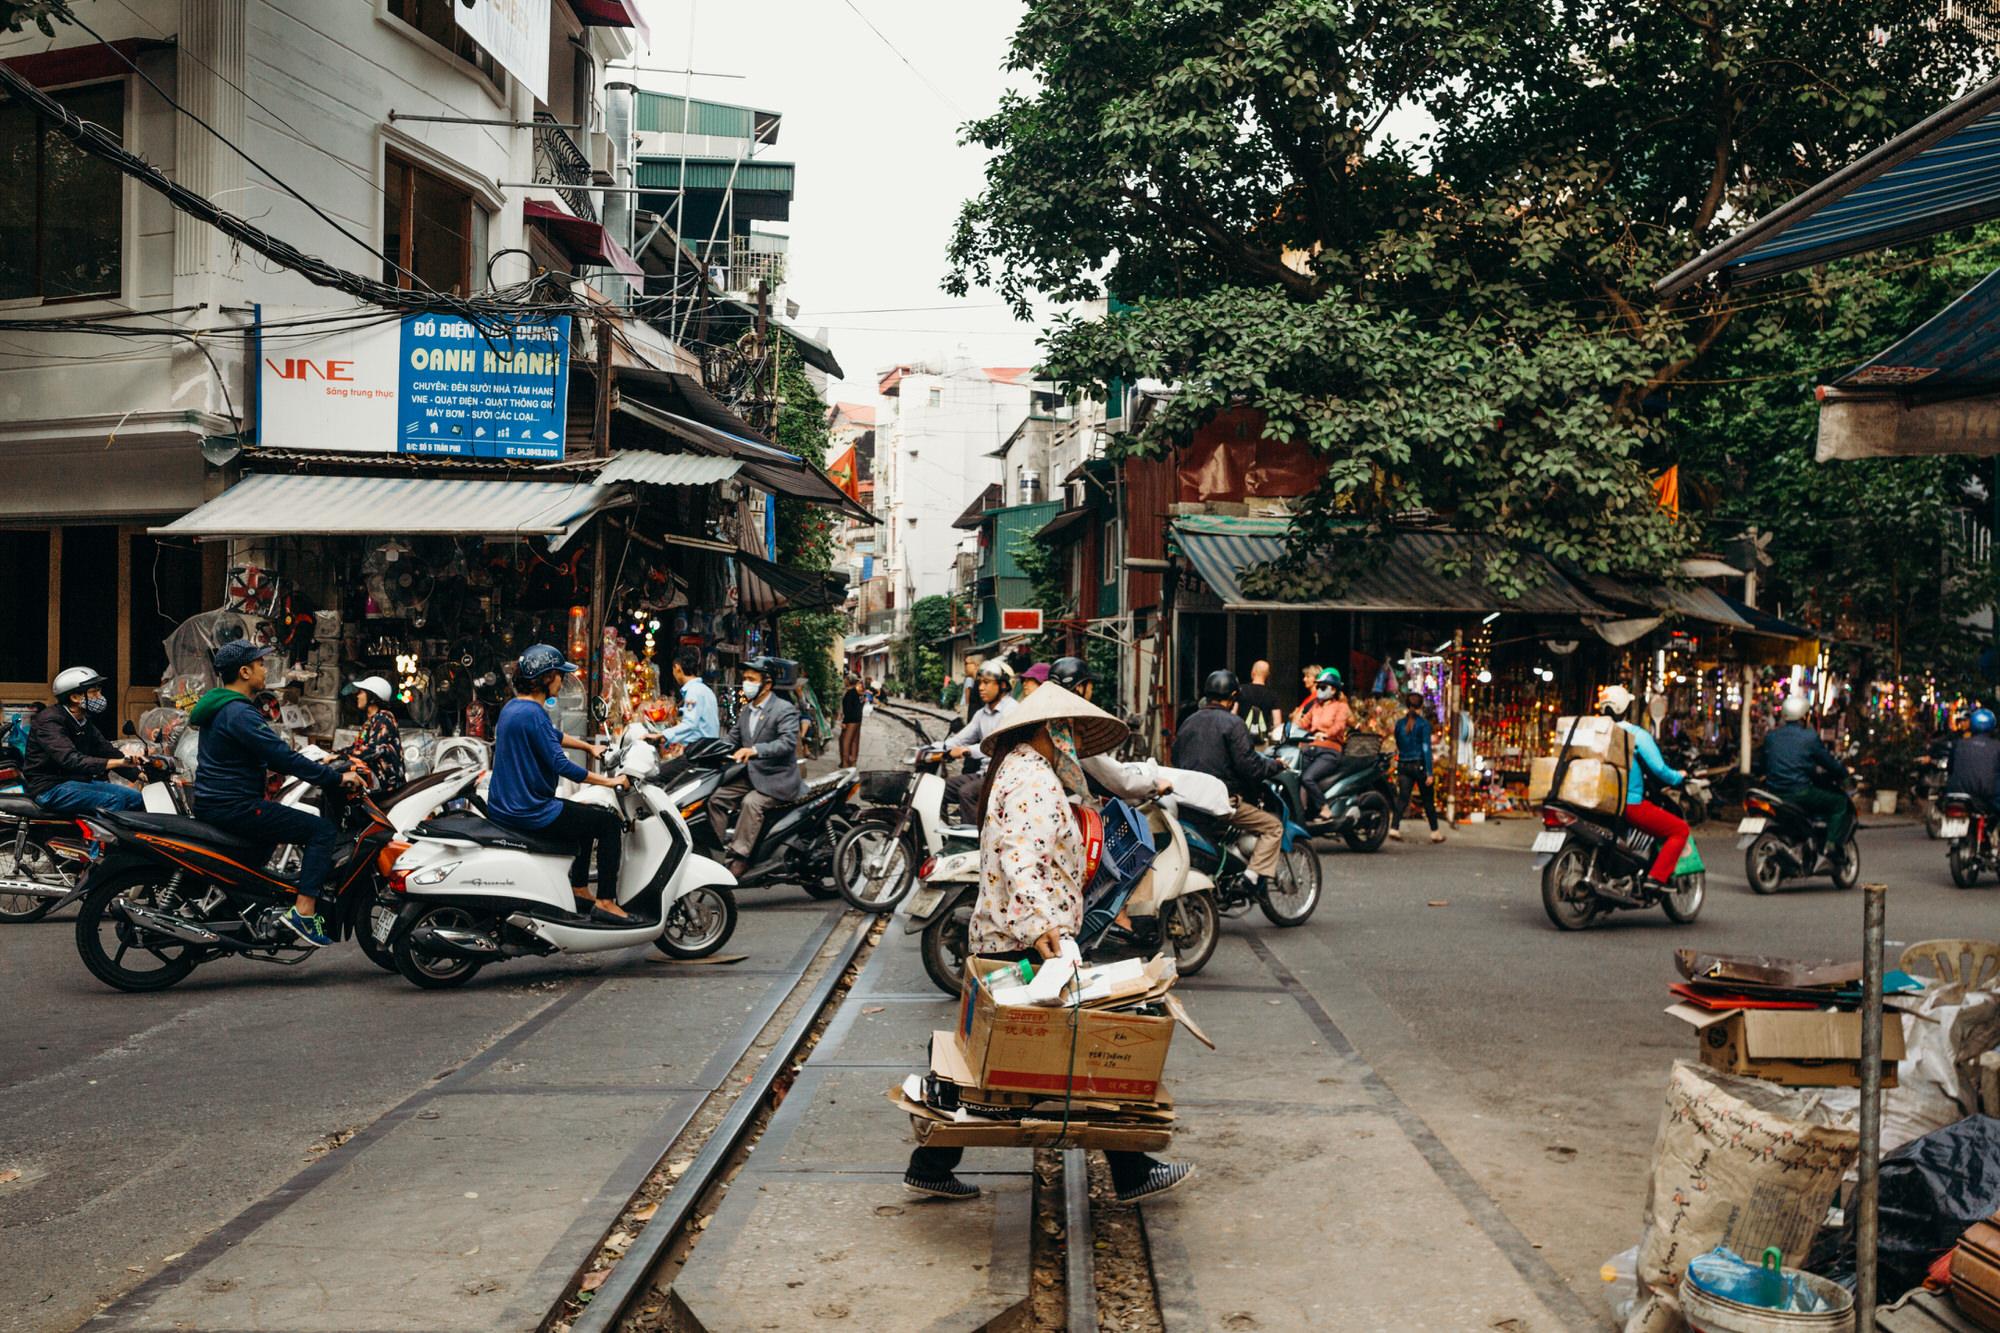 hanoivietnamcitytravelblog-9828-1.jpg